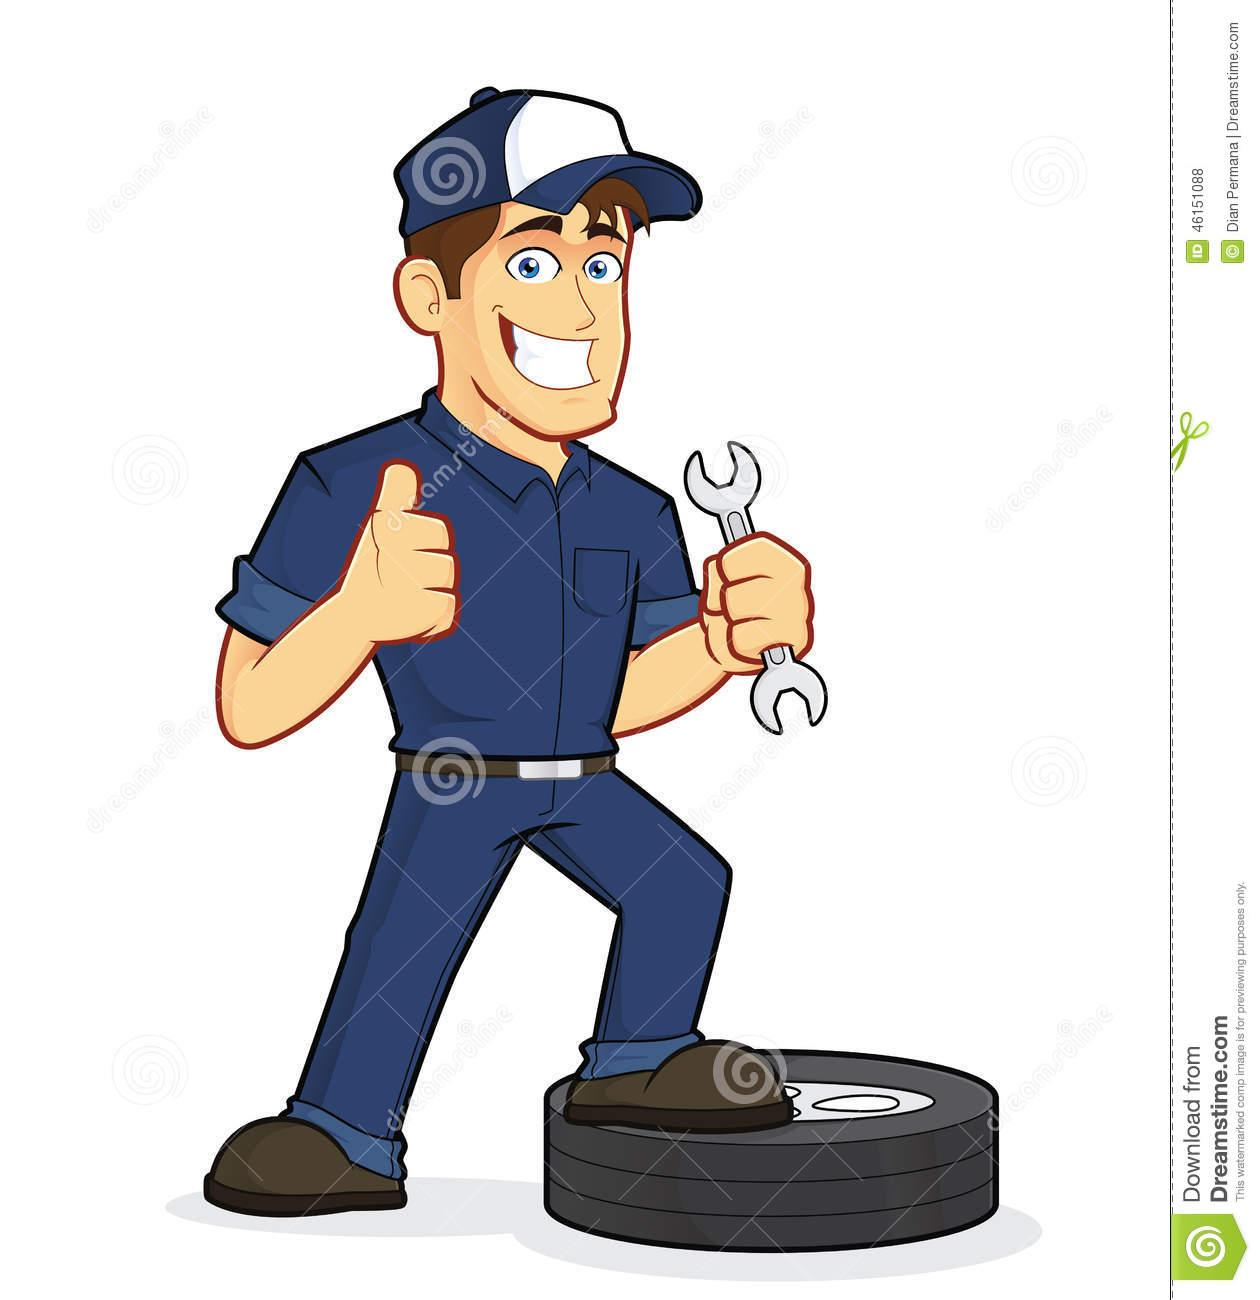 Motor Mechanic Clipart.